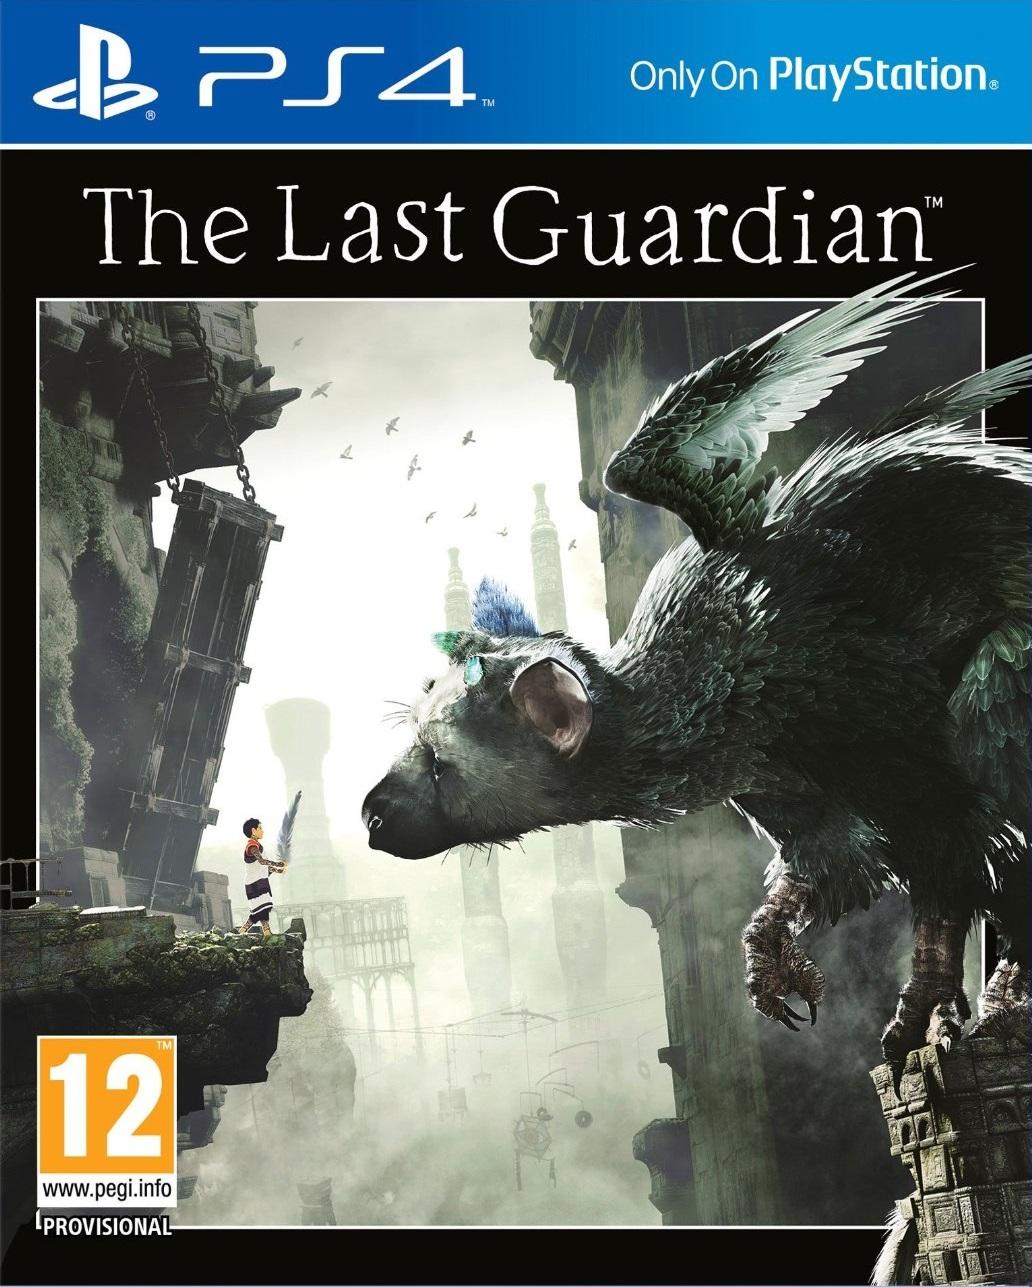 The Last Guardian: due patch saranno disponibili al day-one